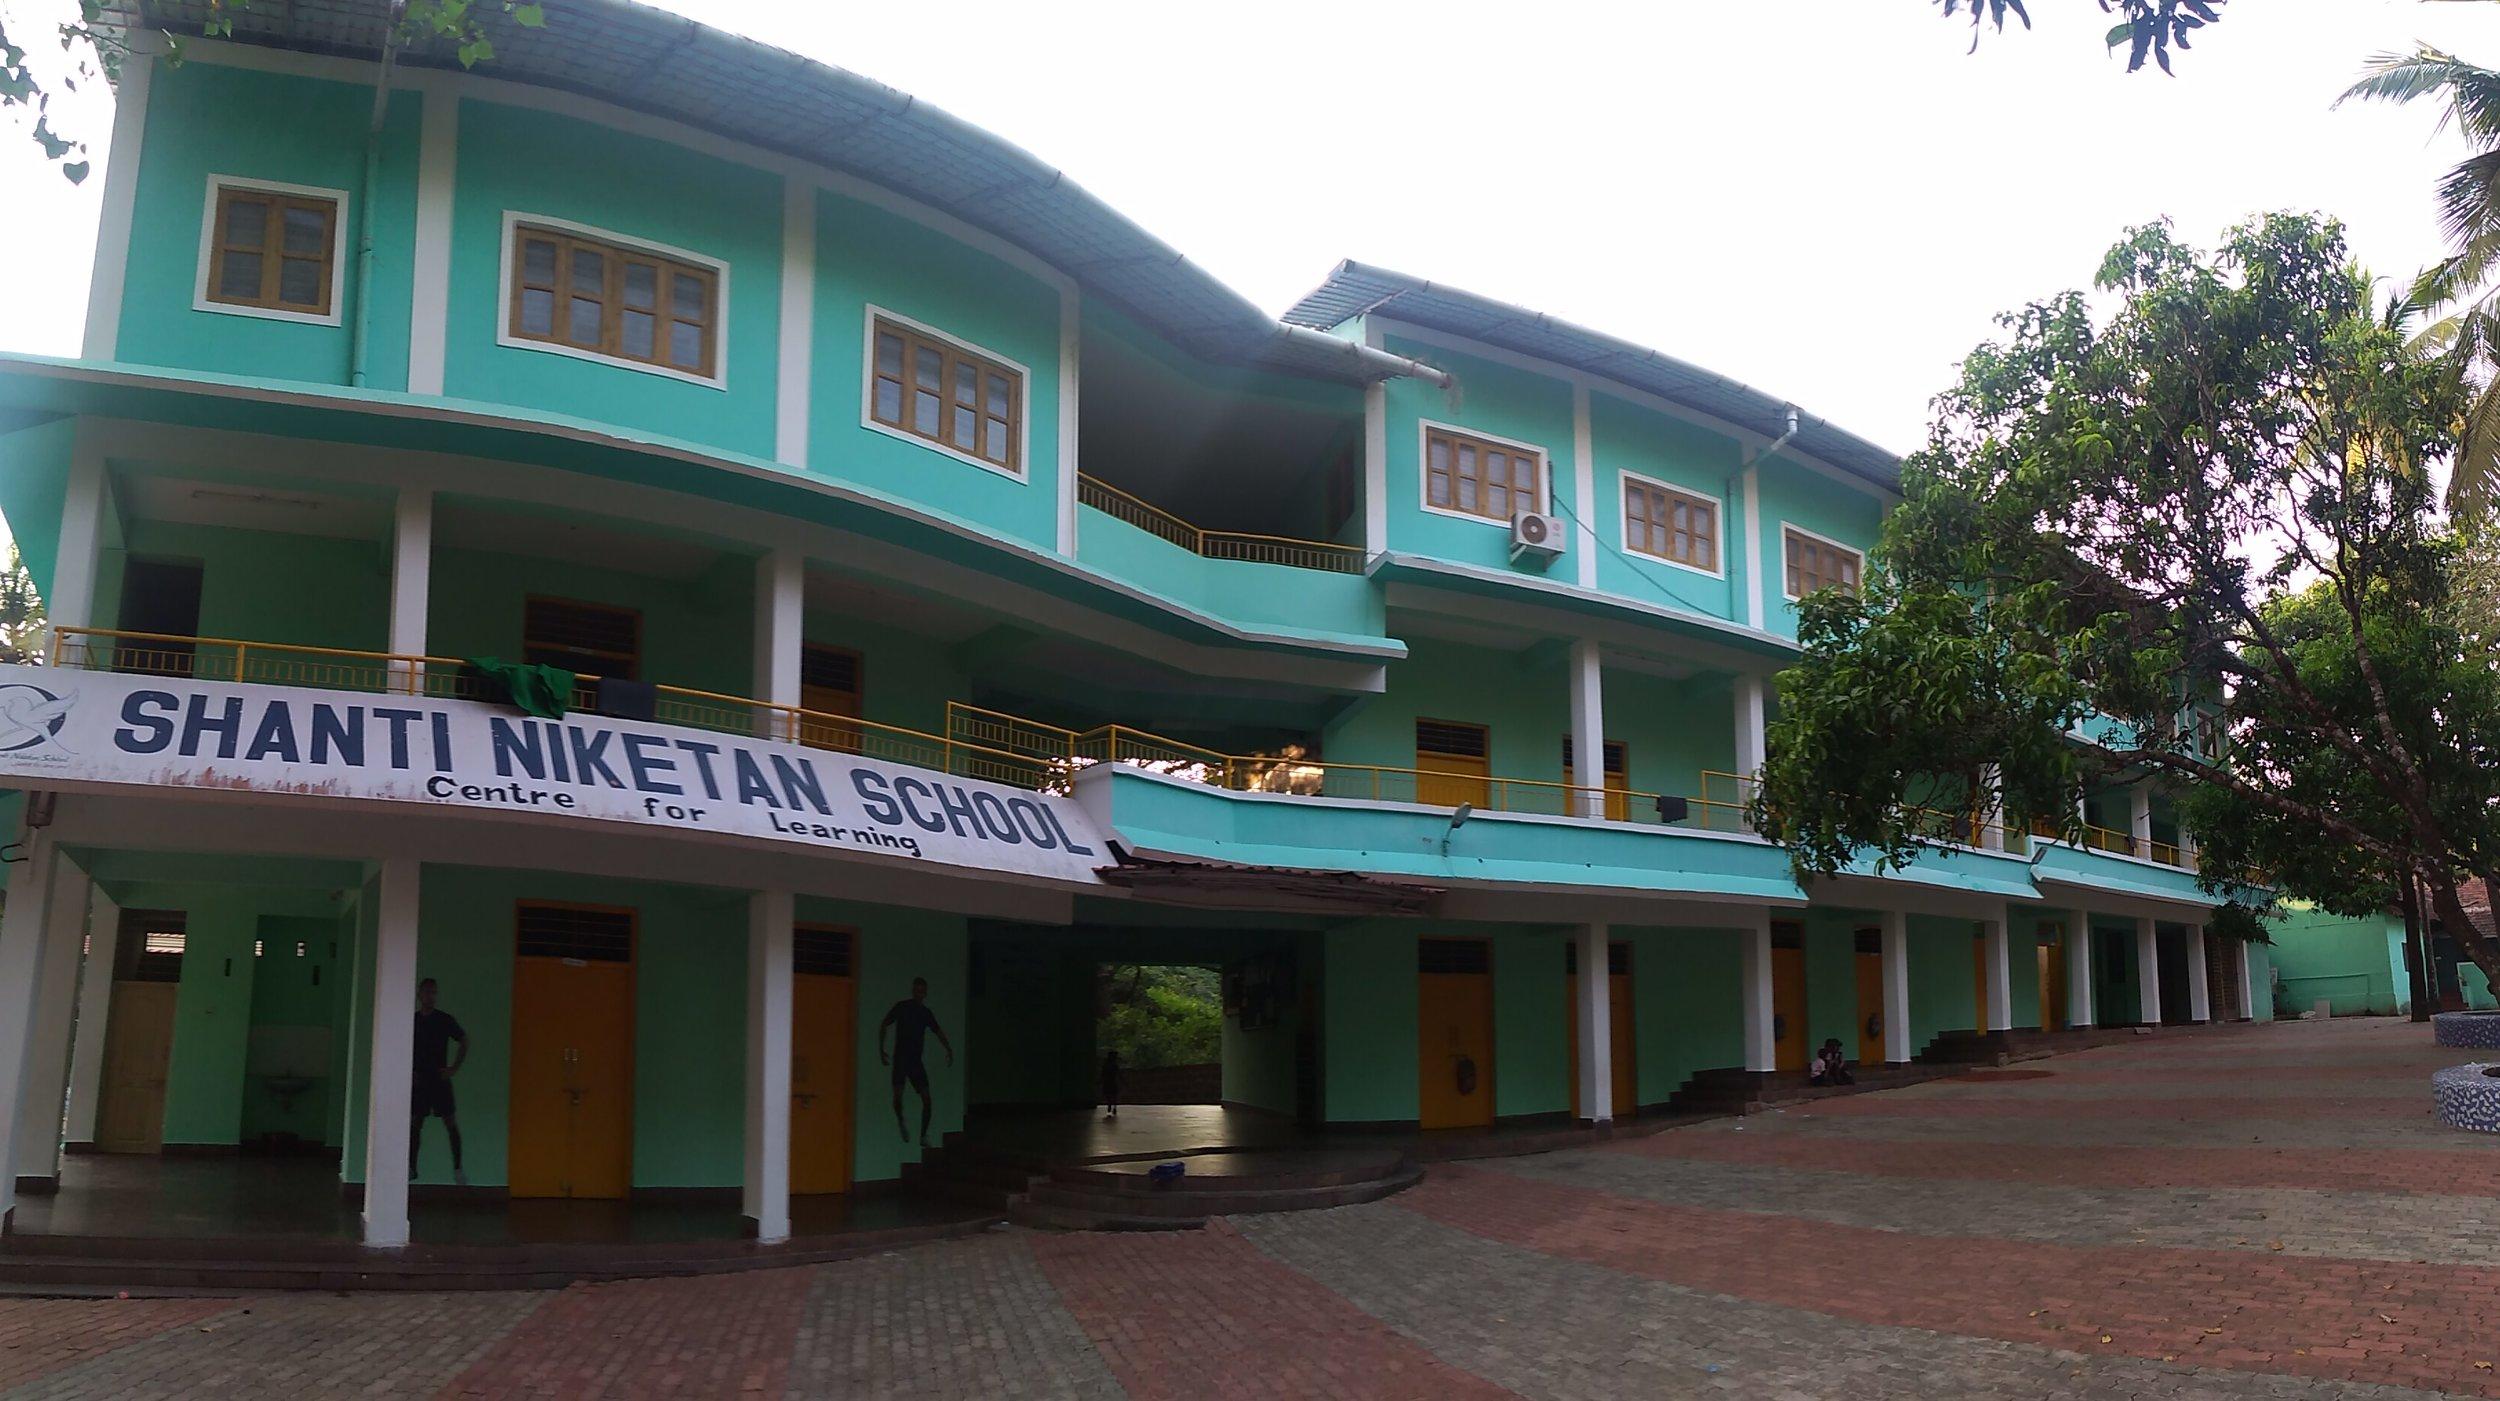 Shanti Niketan School - 10.jpg